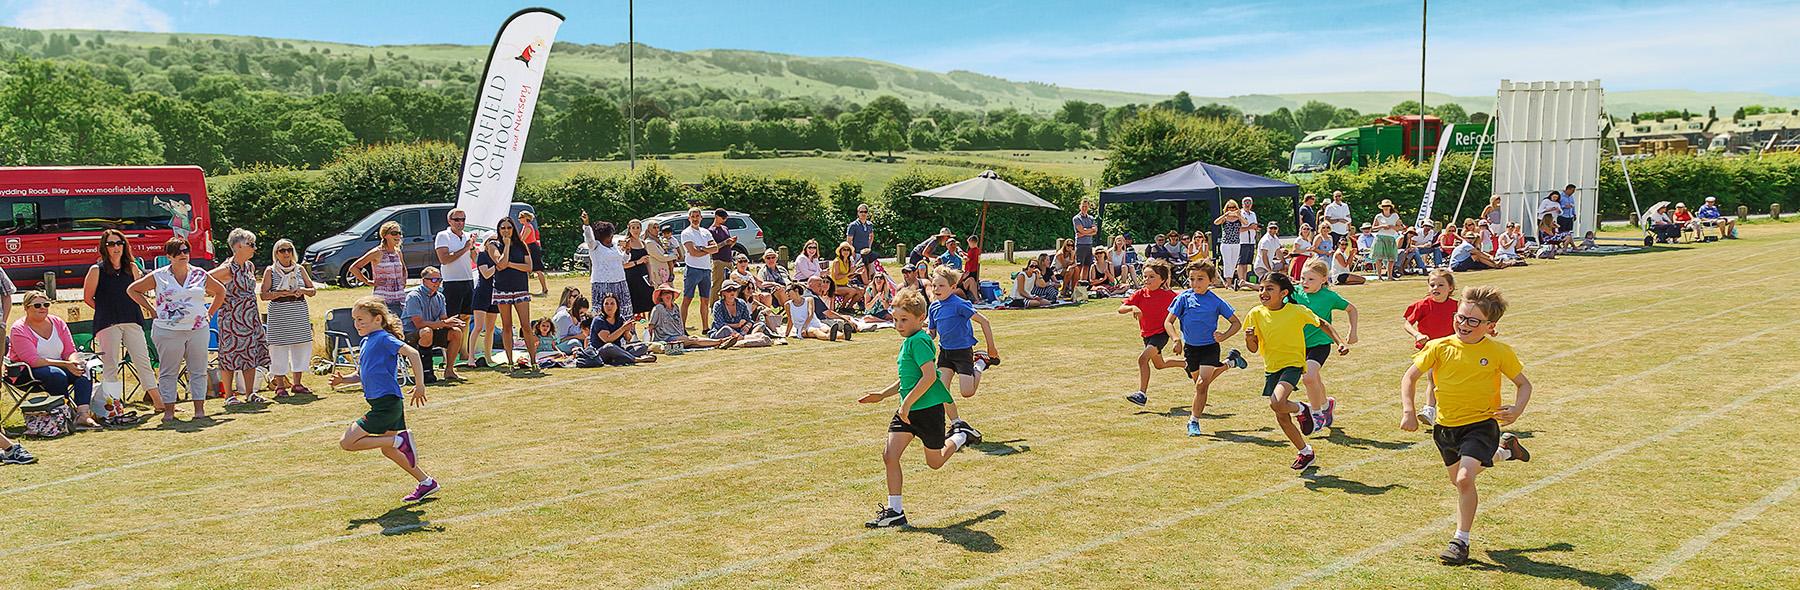 Activities -Sports Day-June 2018